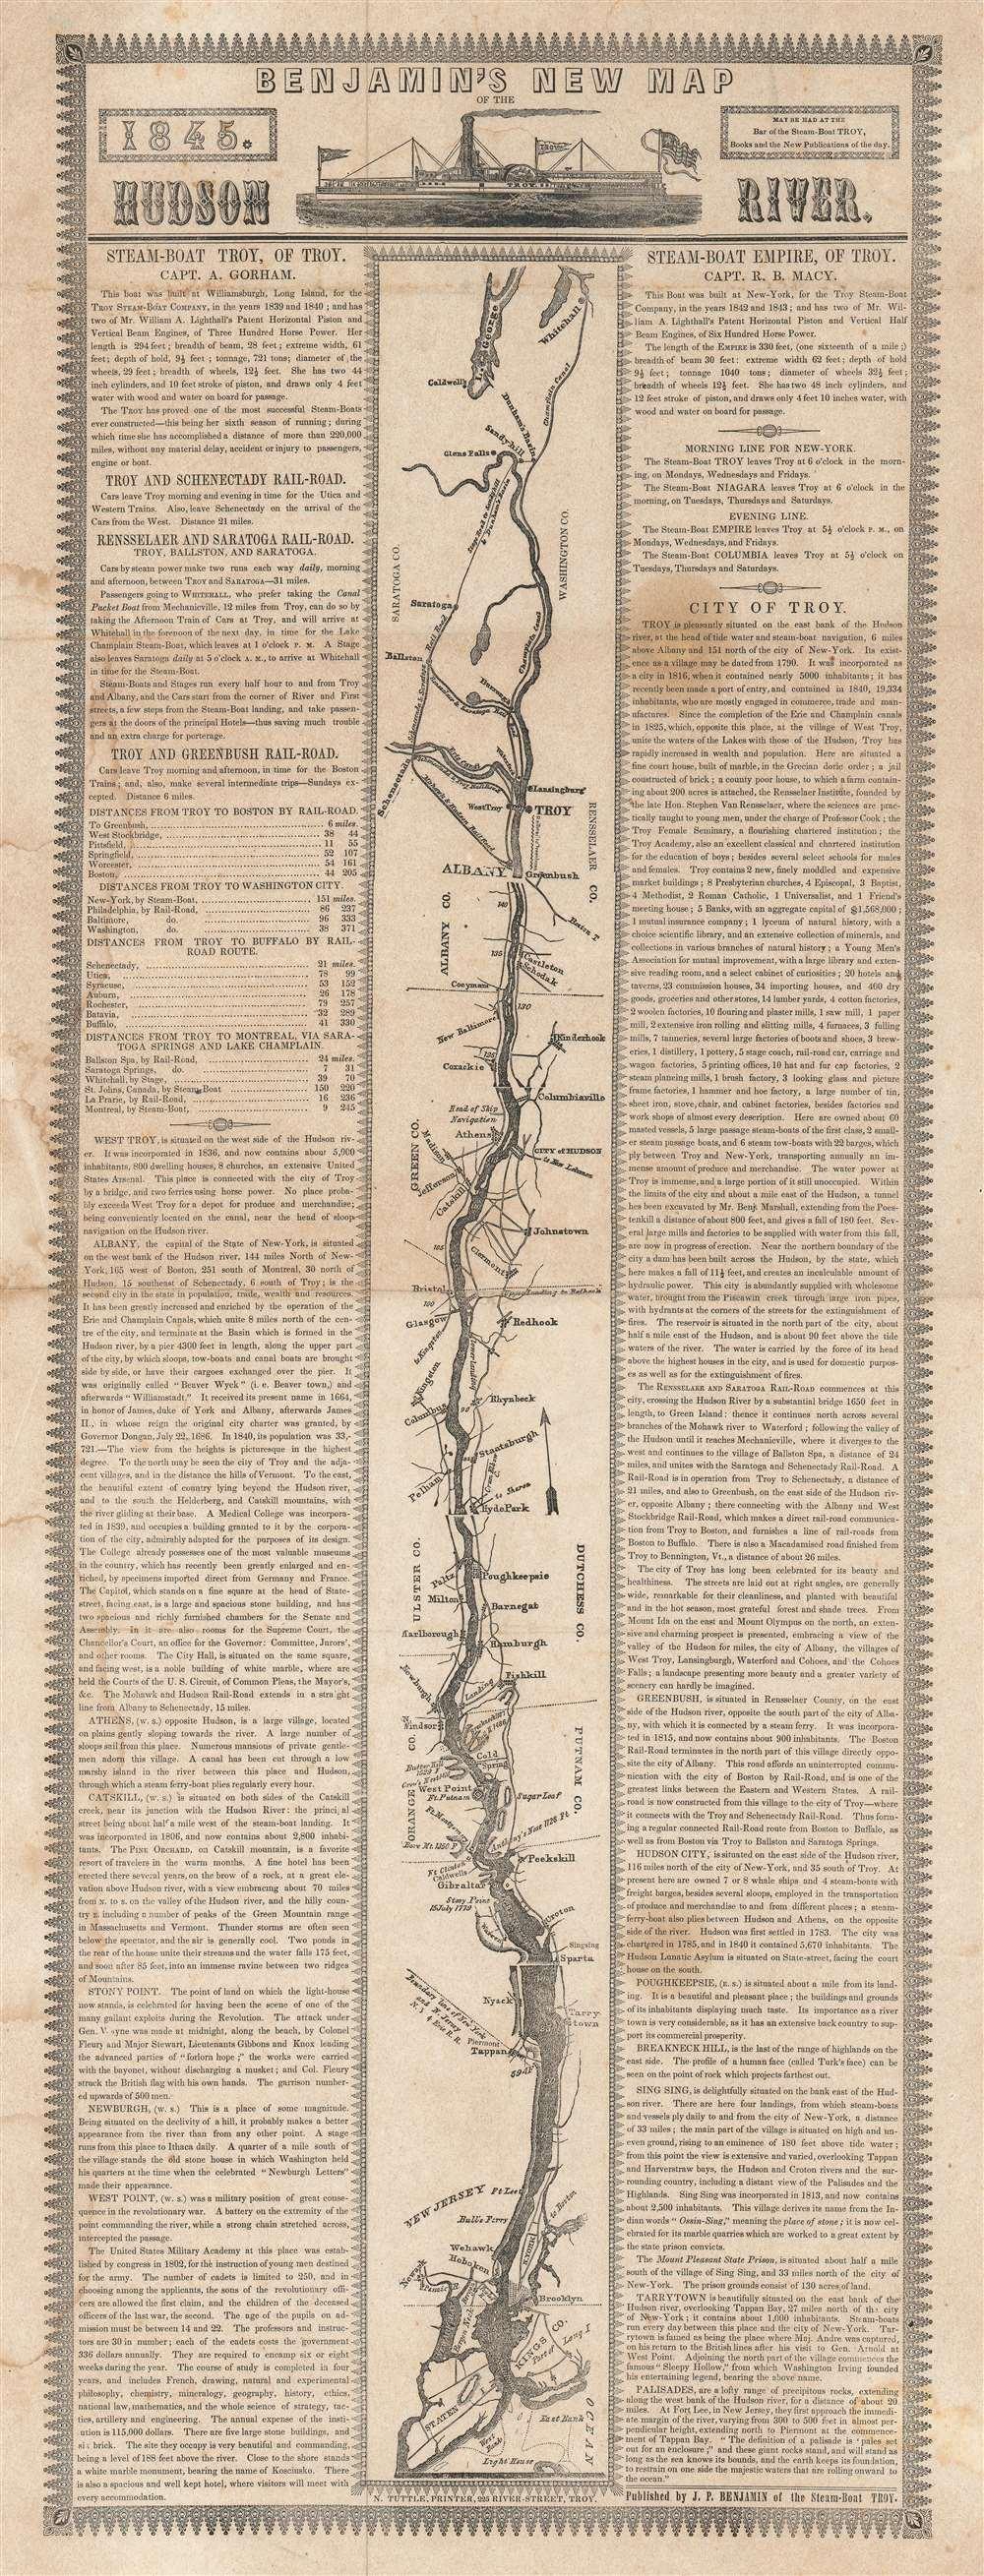 Benjamin's New Map of the Hudson River.